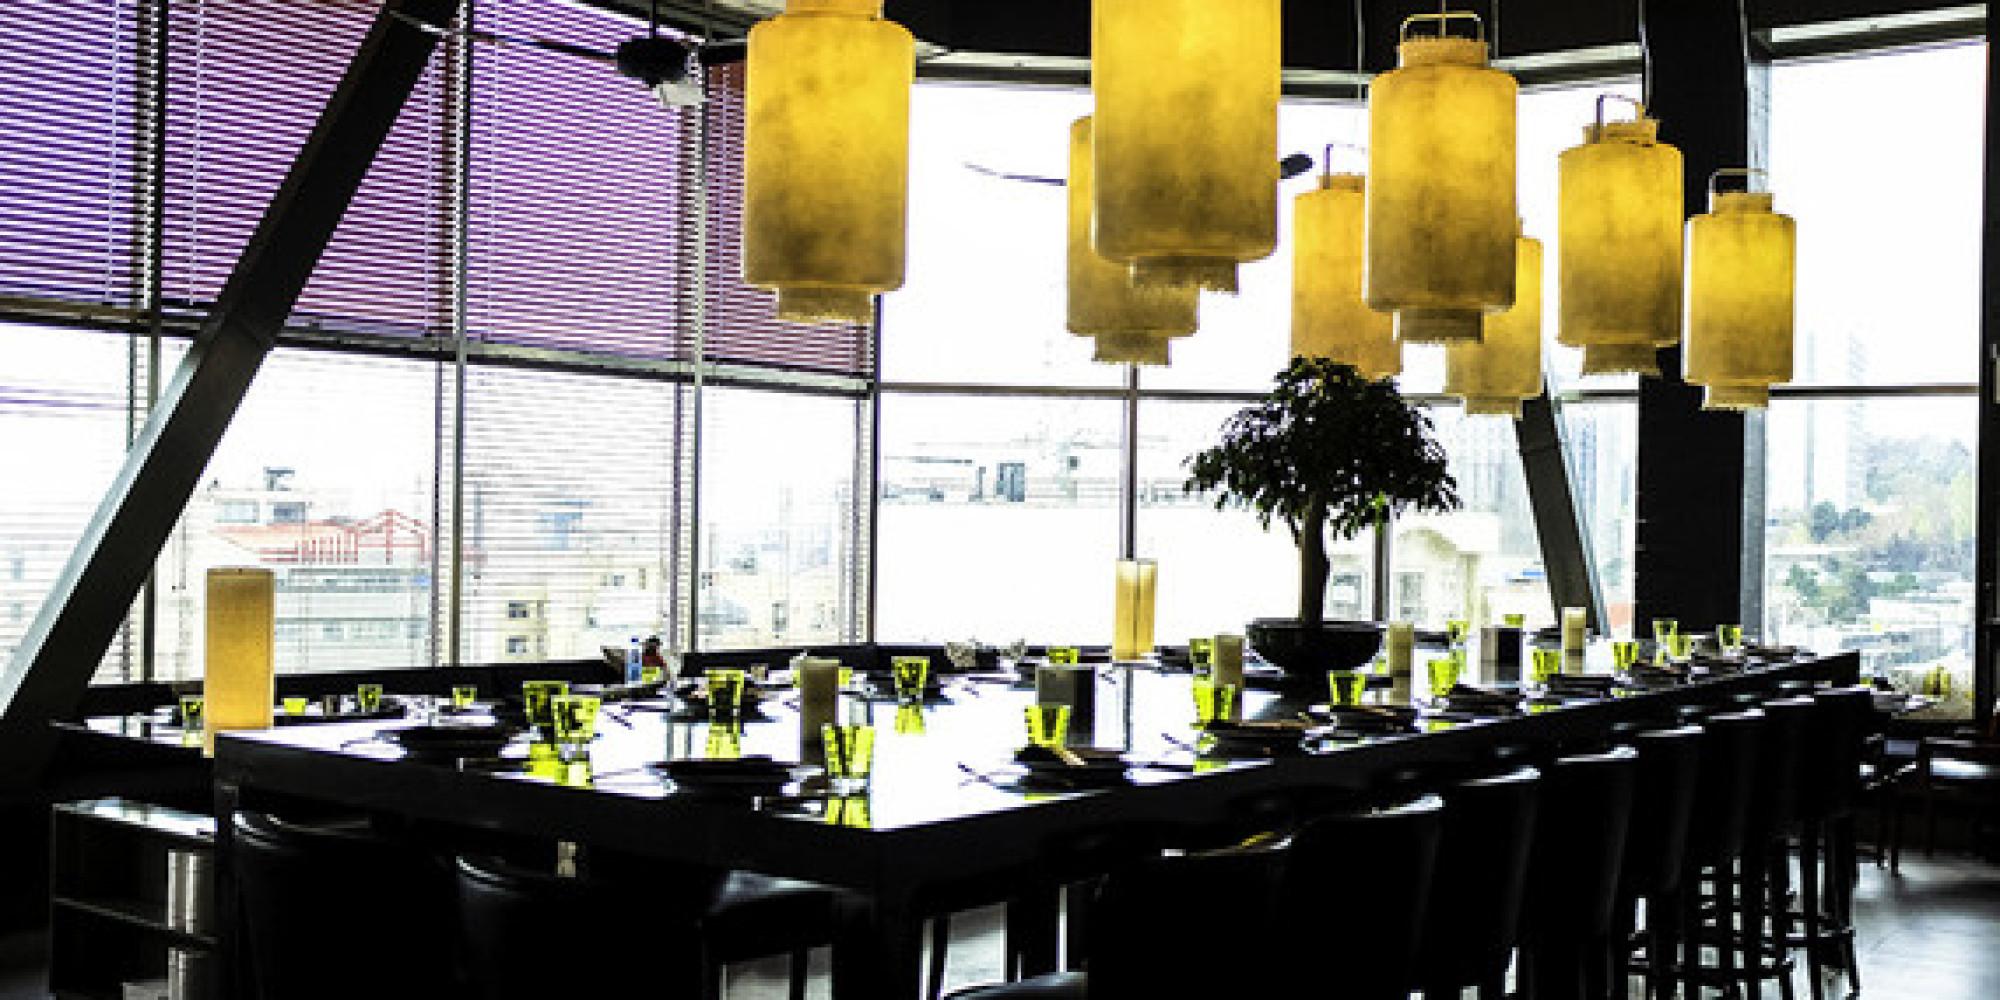 Top 10 tehran restaurants a culinary journey through iran for Divan tehran